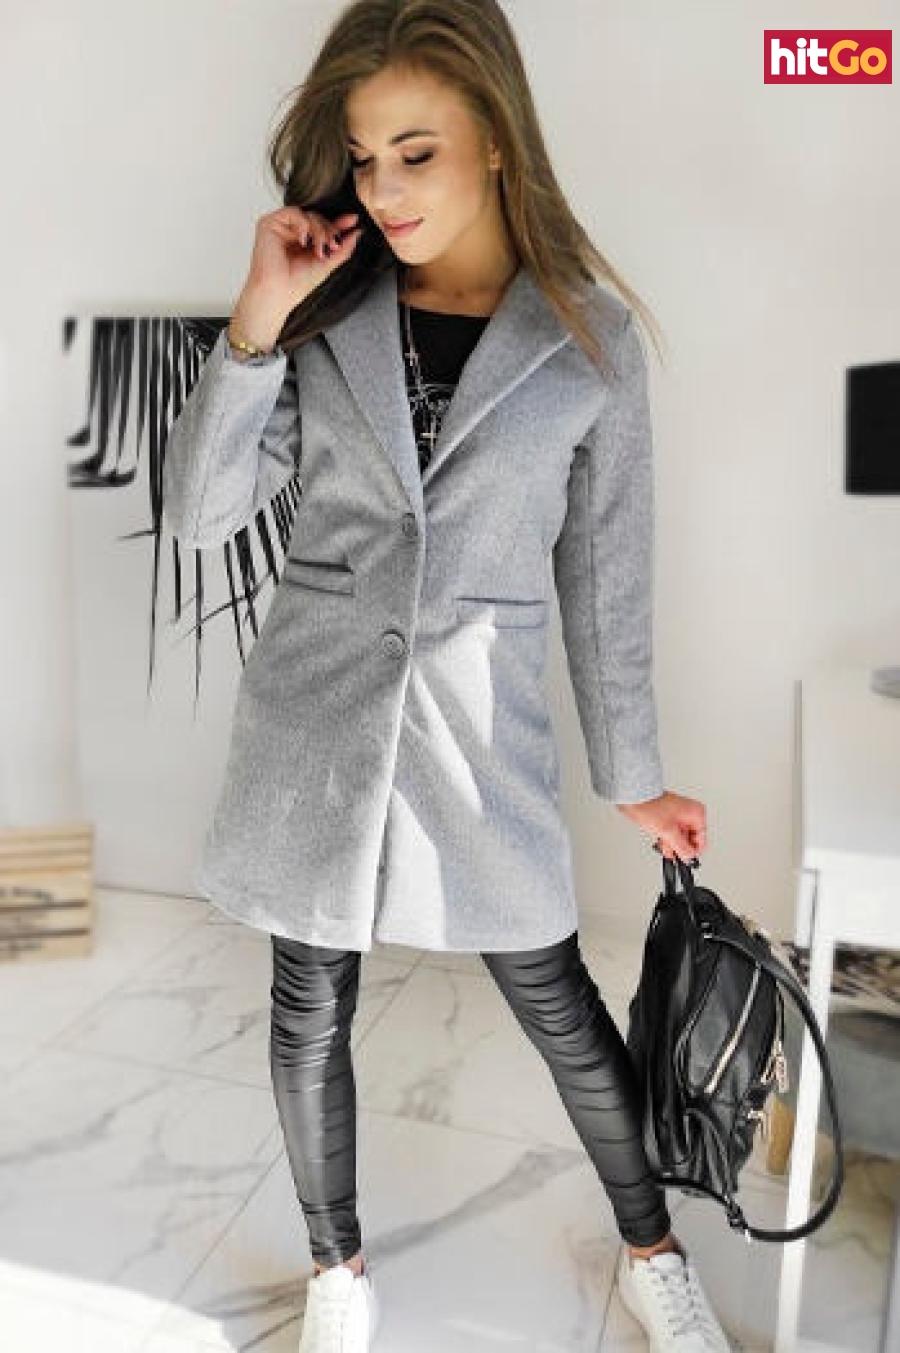 Single-breasted womens coat DRESNO gray NY0382 dámské Neurčeno L